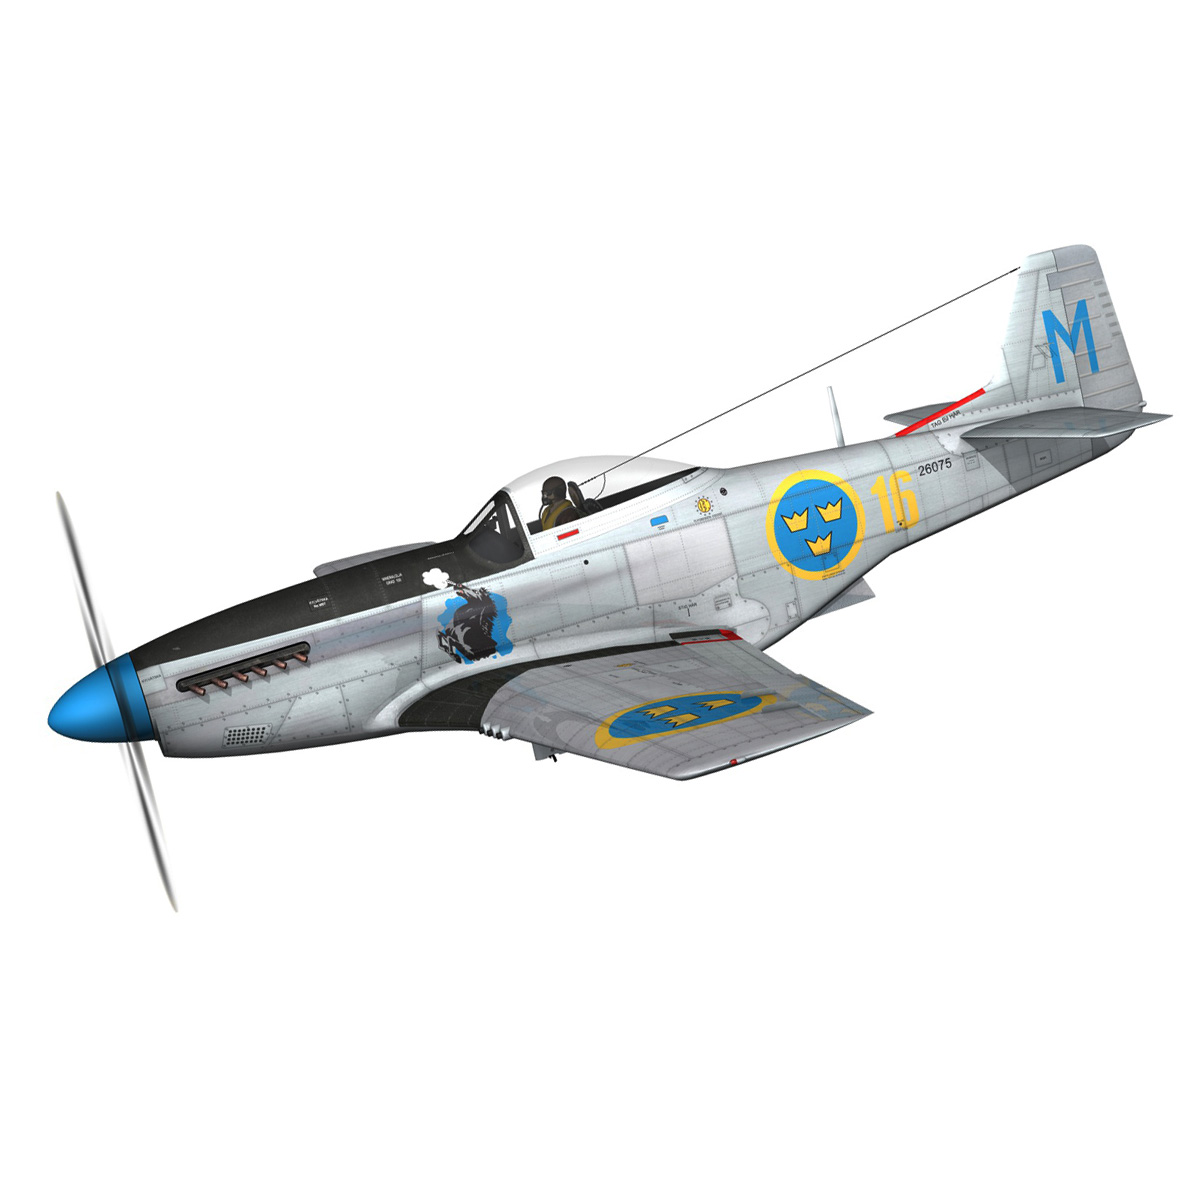 north american p-51d mustang – swedisch airforce 3d model fbx c4d lwo obj 268227